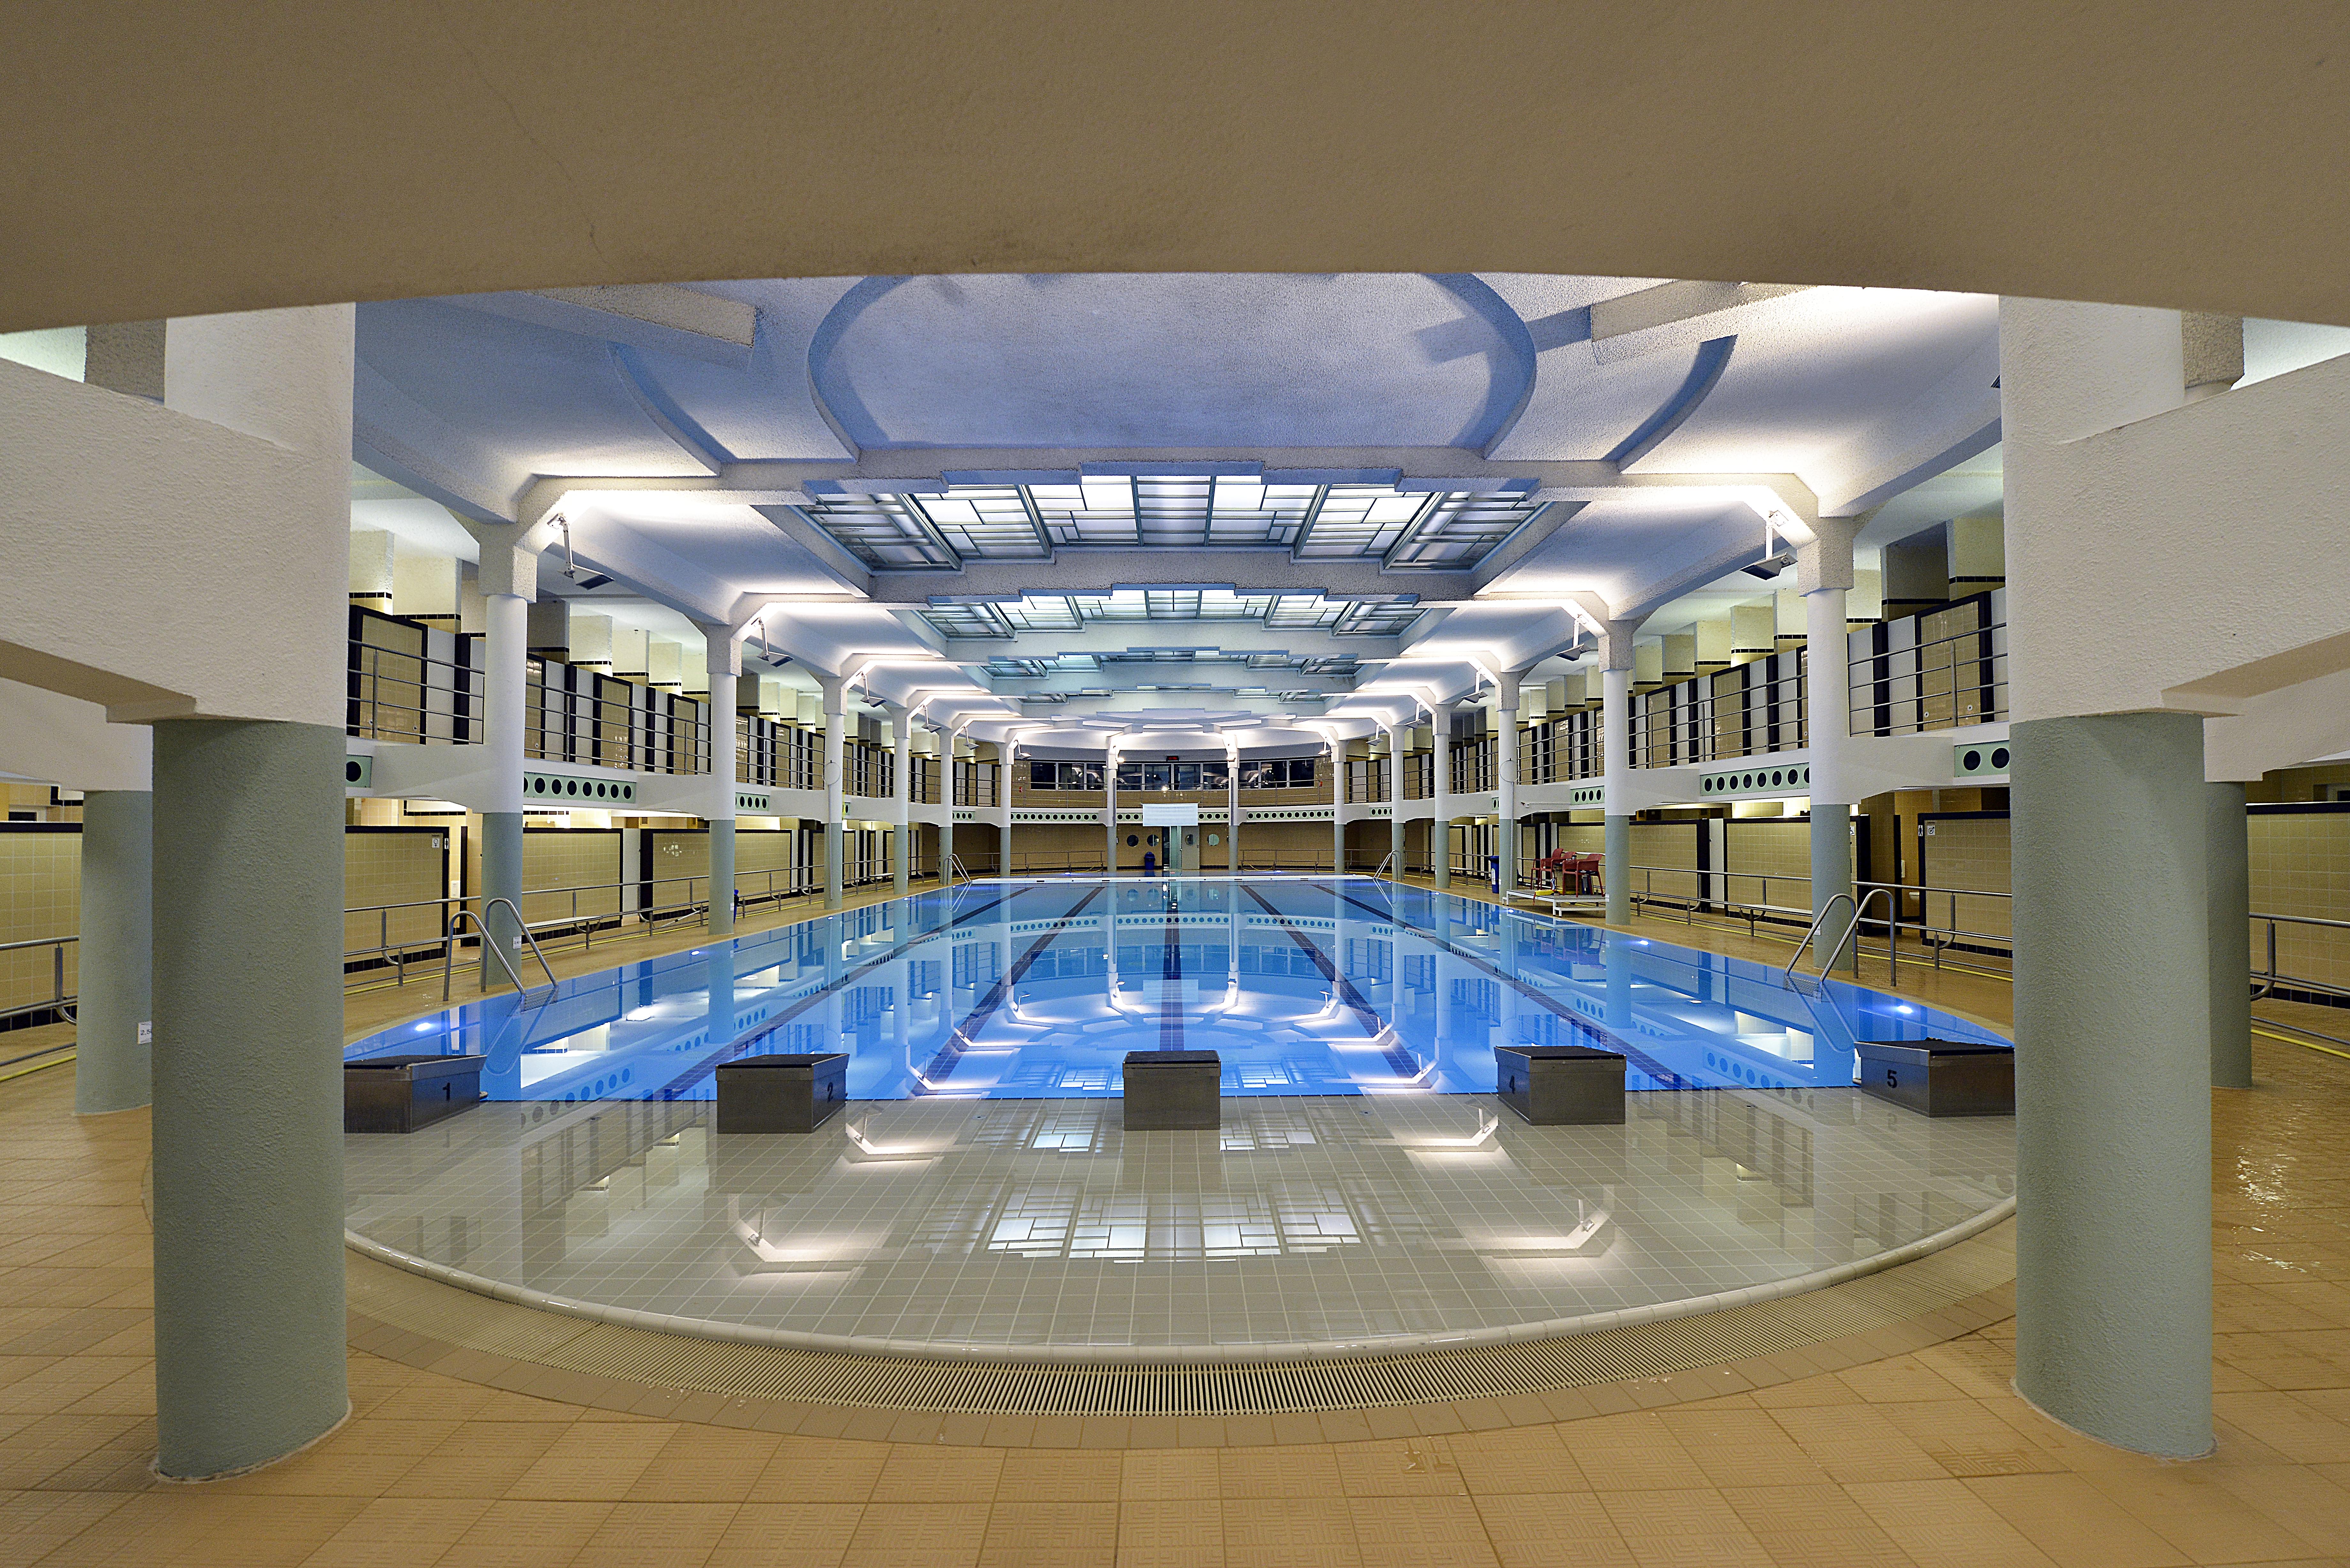 Schwimmbad van eyck visit gent